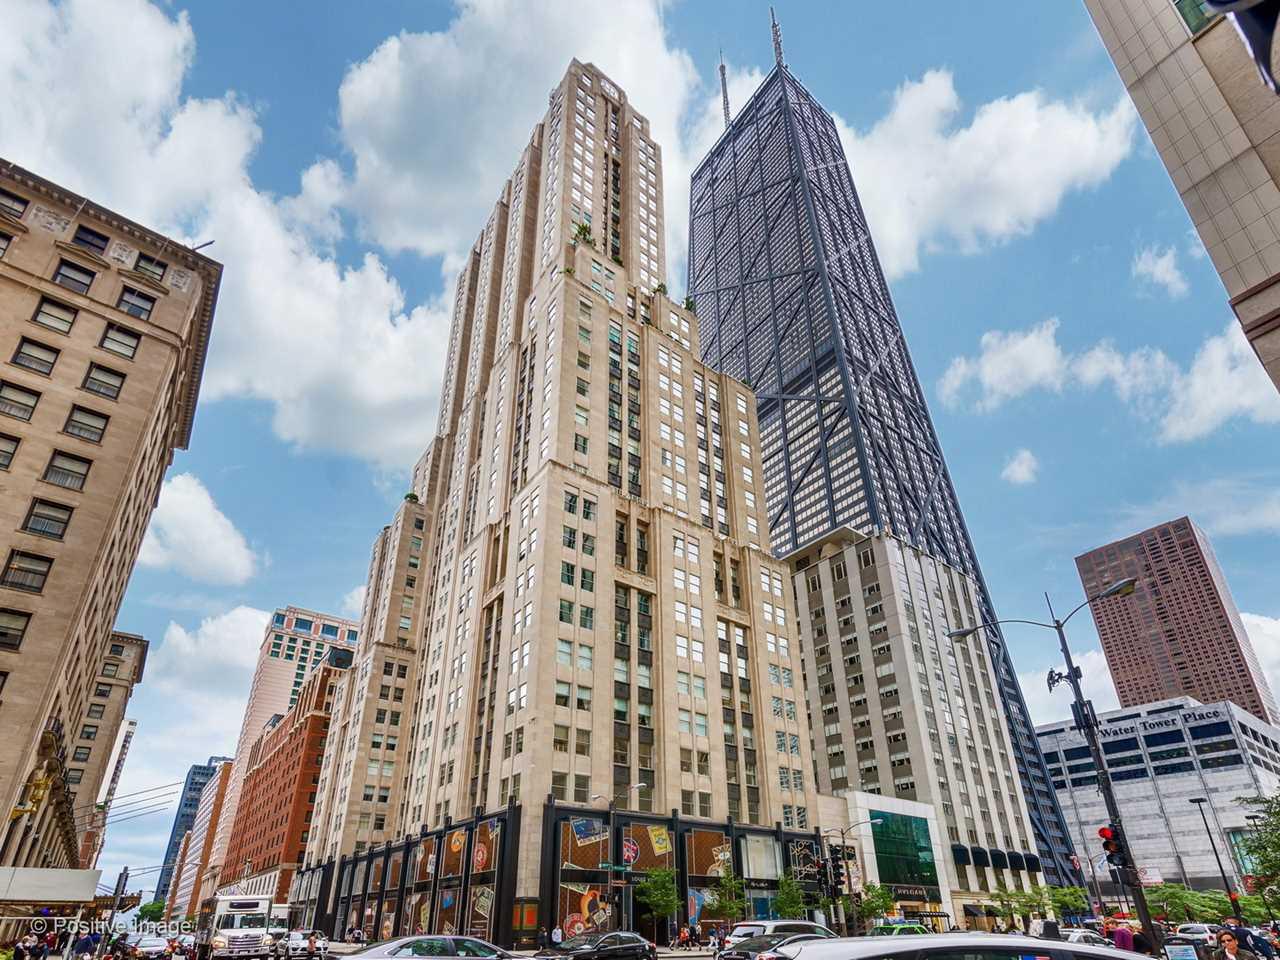 159 WALTON Place #23A Chicago, IL 60611 | MLS 09862752 Photo 1